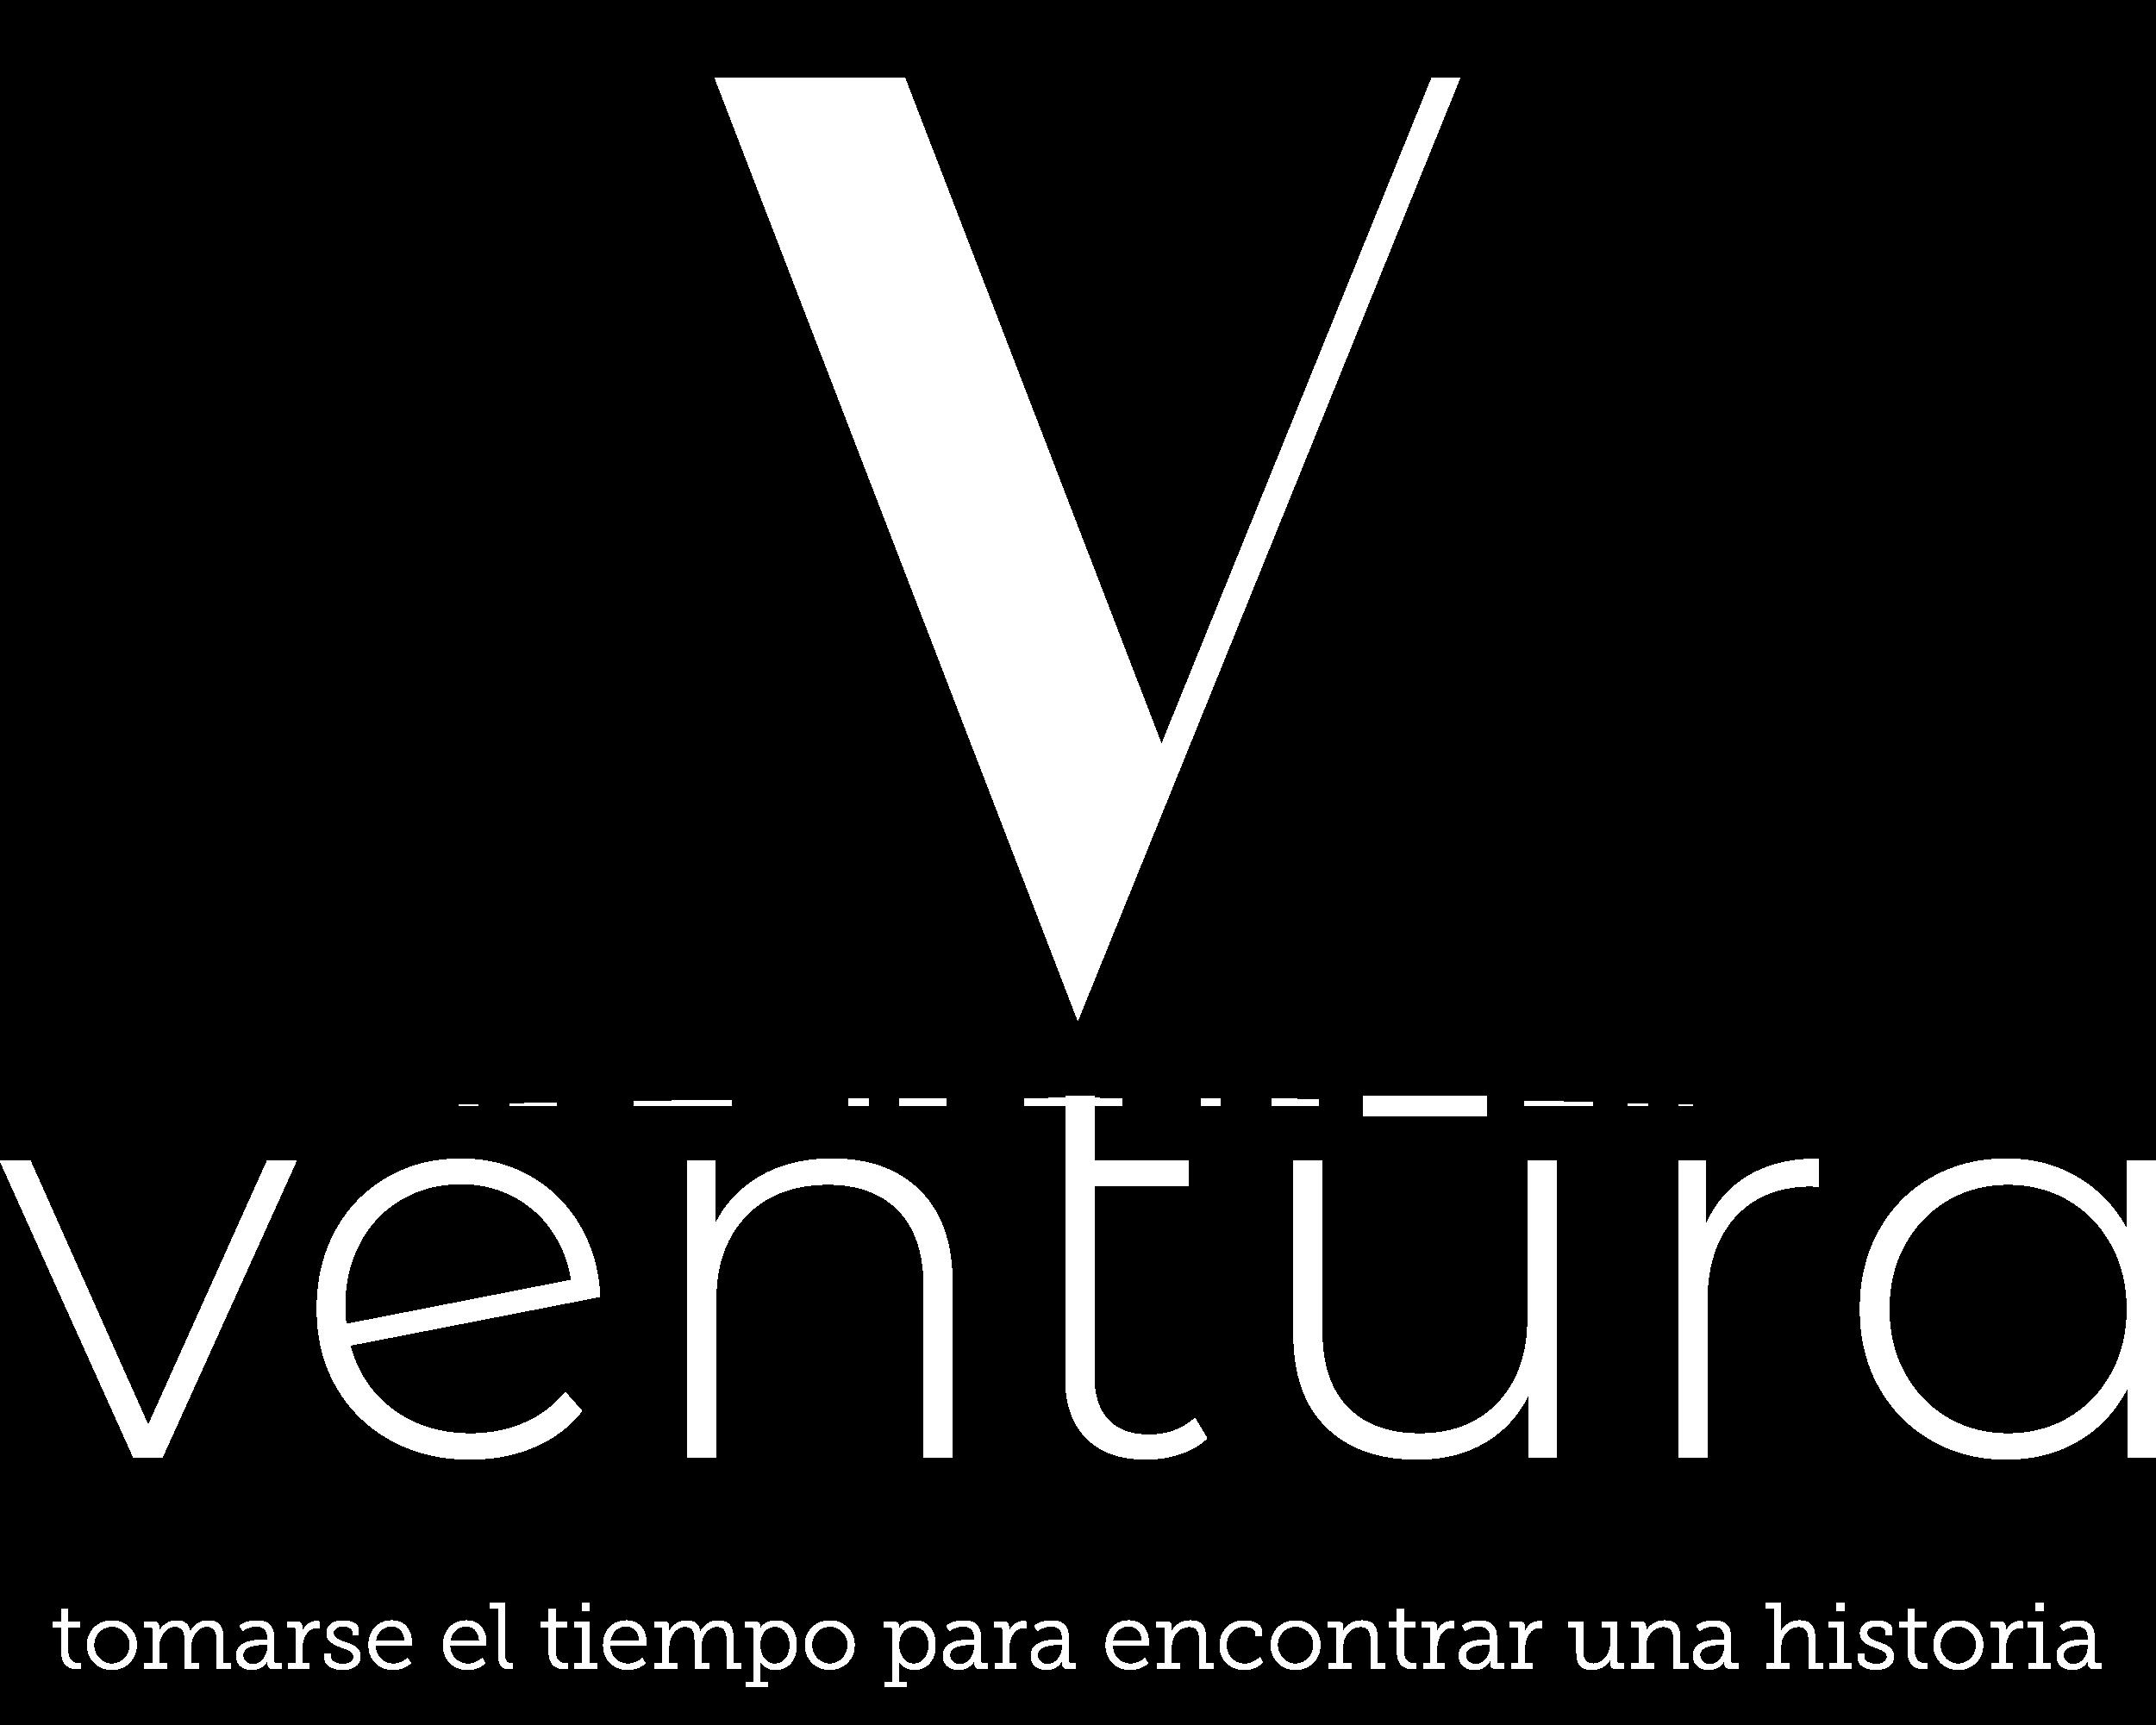 Ventūra